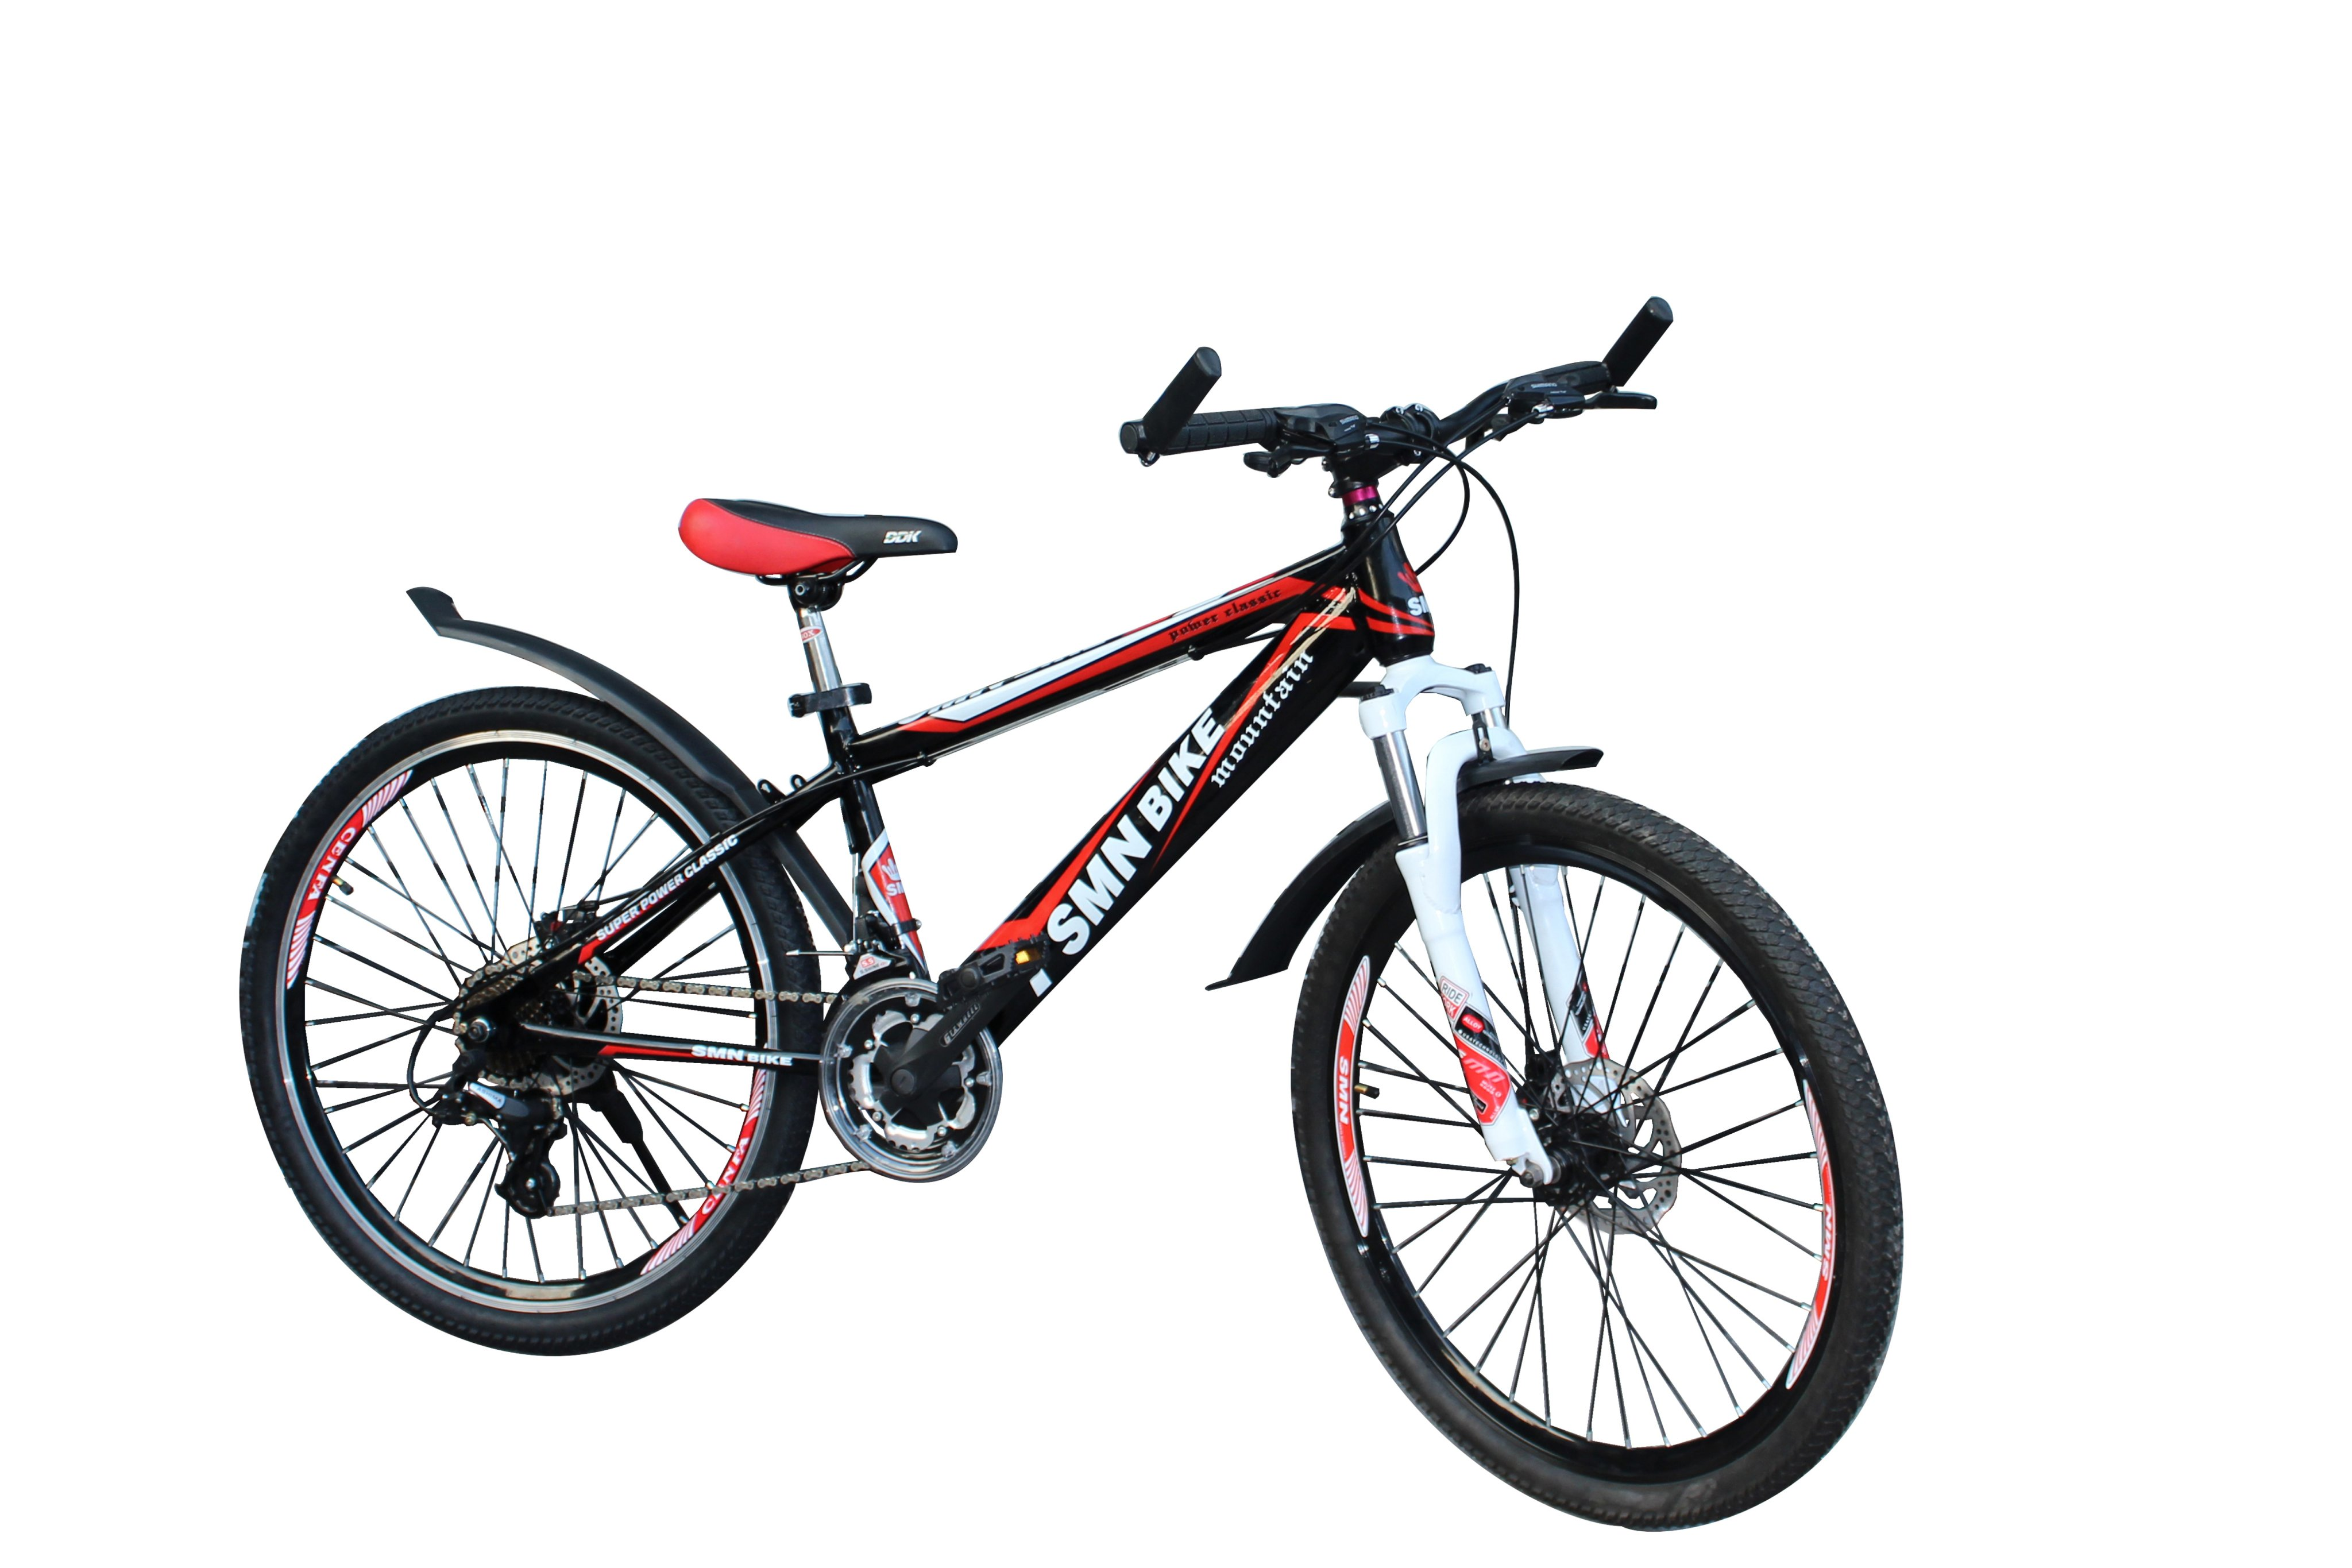 Mua Xe đạp thể thao leo núi Smnbike BL26-01